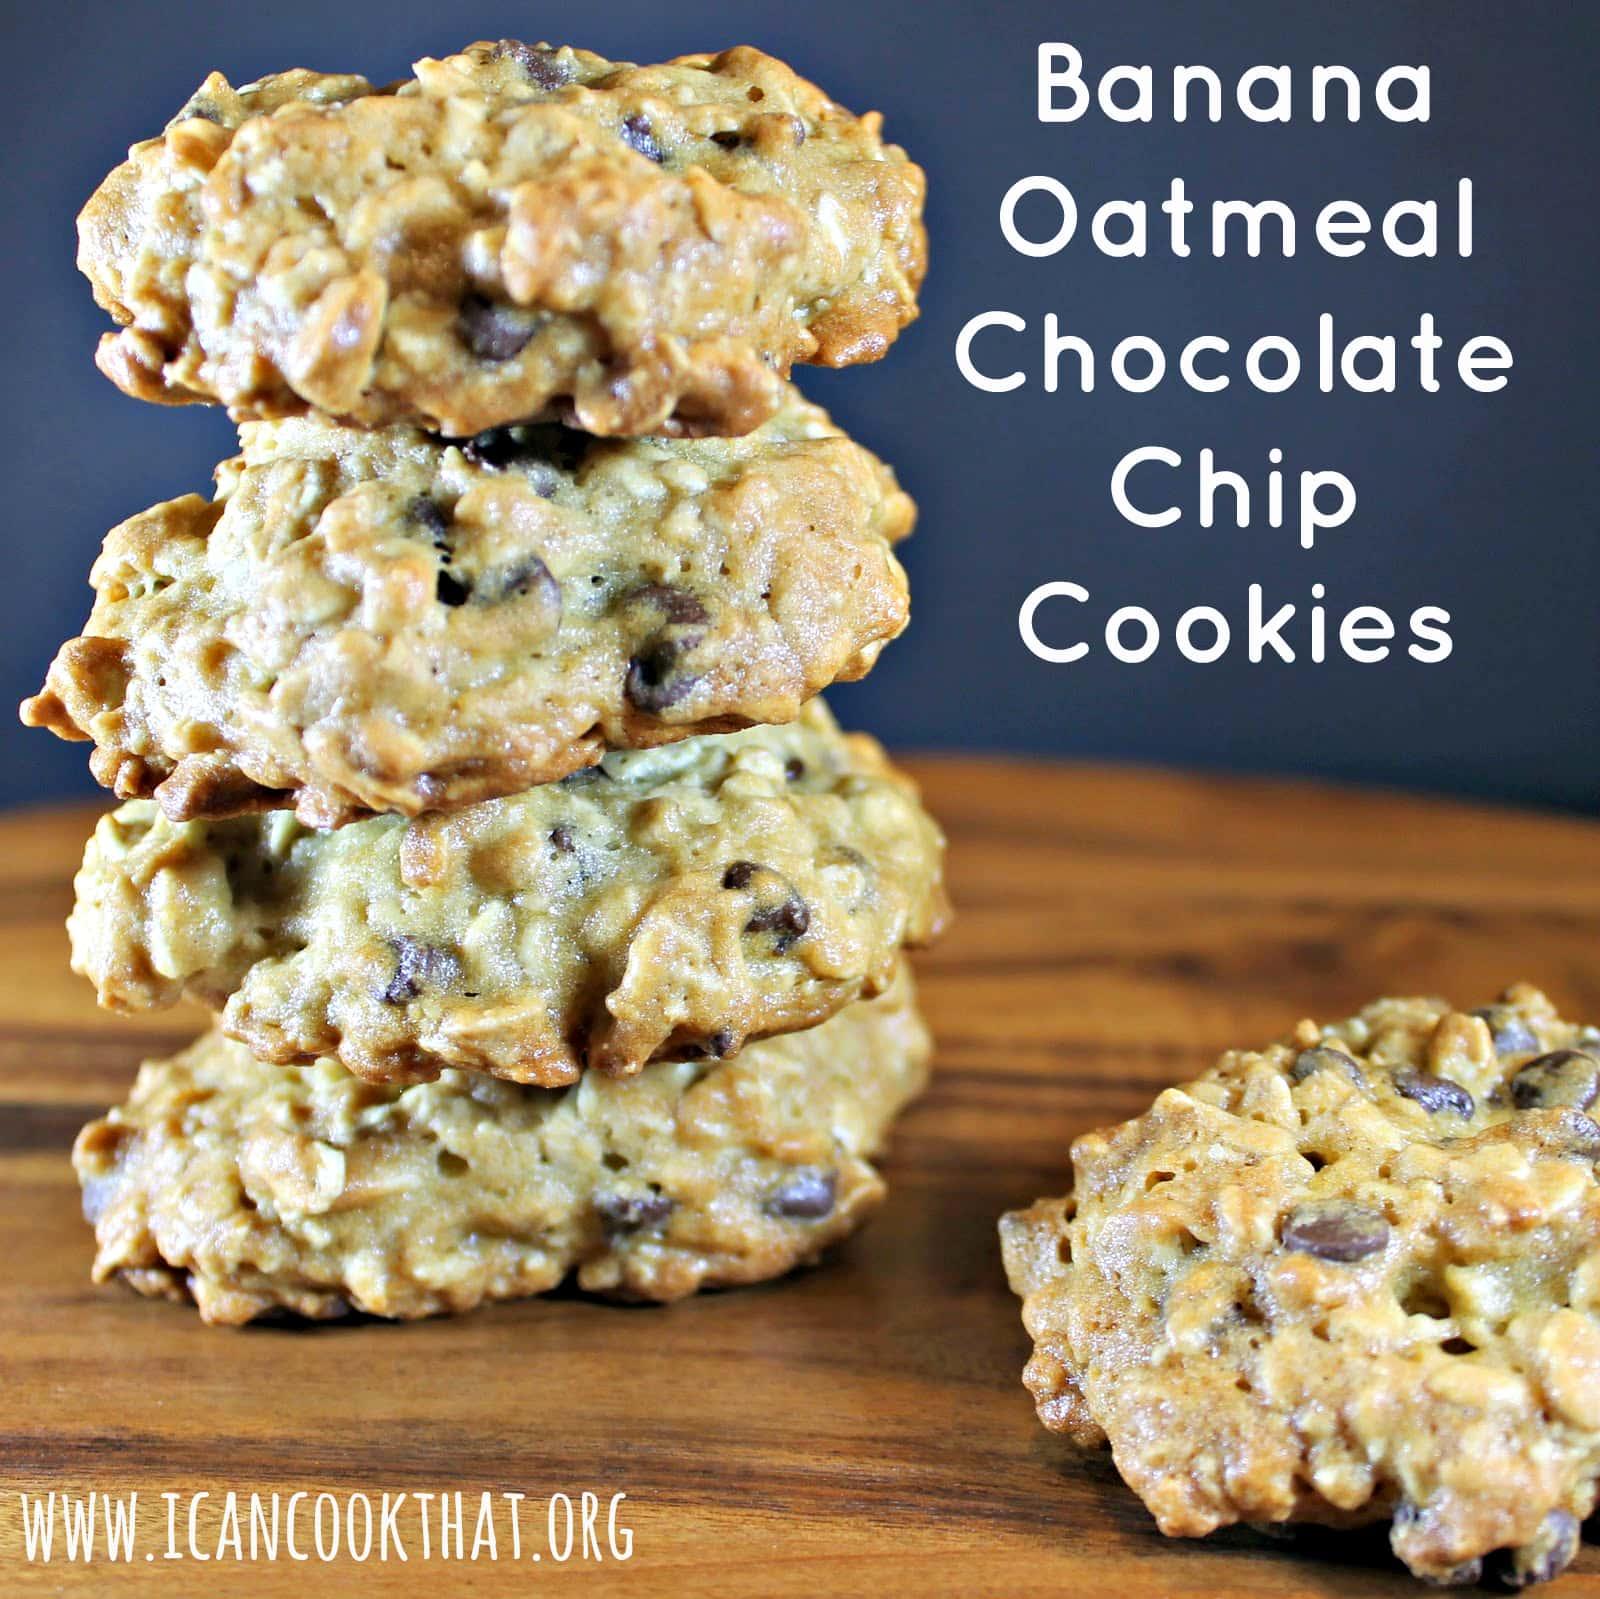 chip cookies recipe yummly banana oatmeal chocolate chip cookies ...